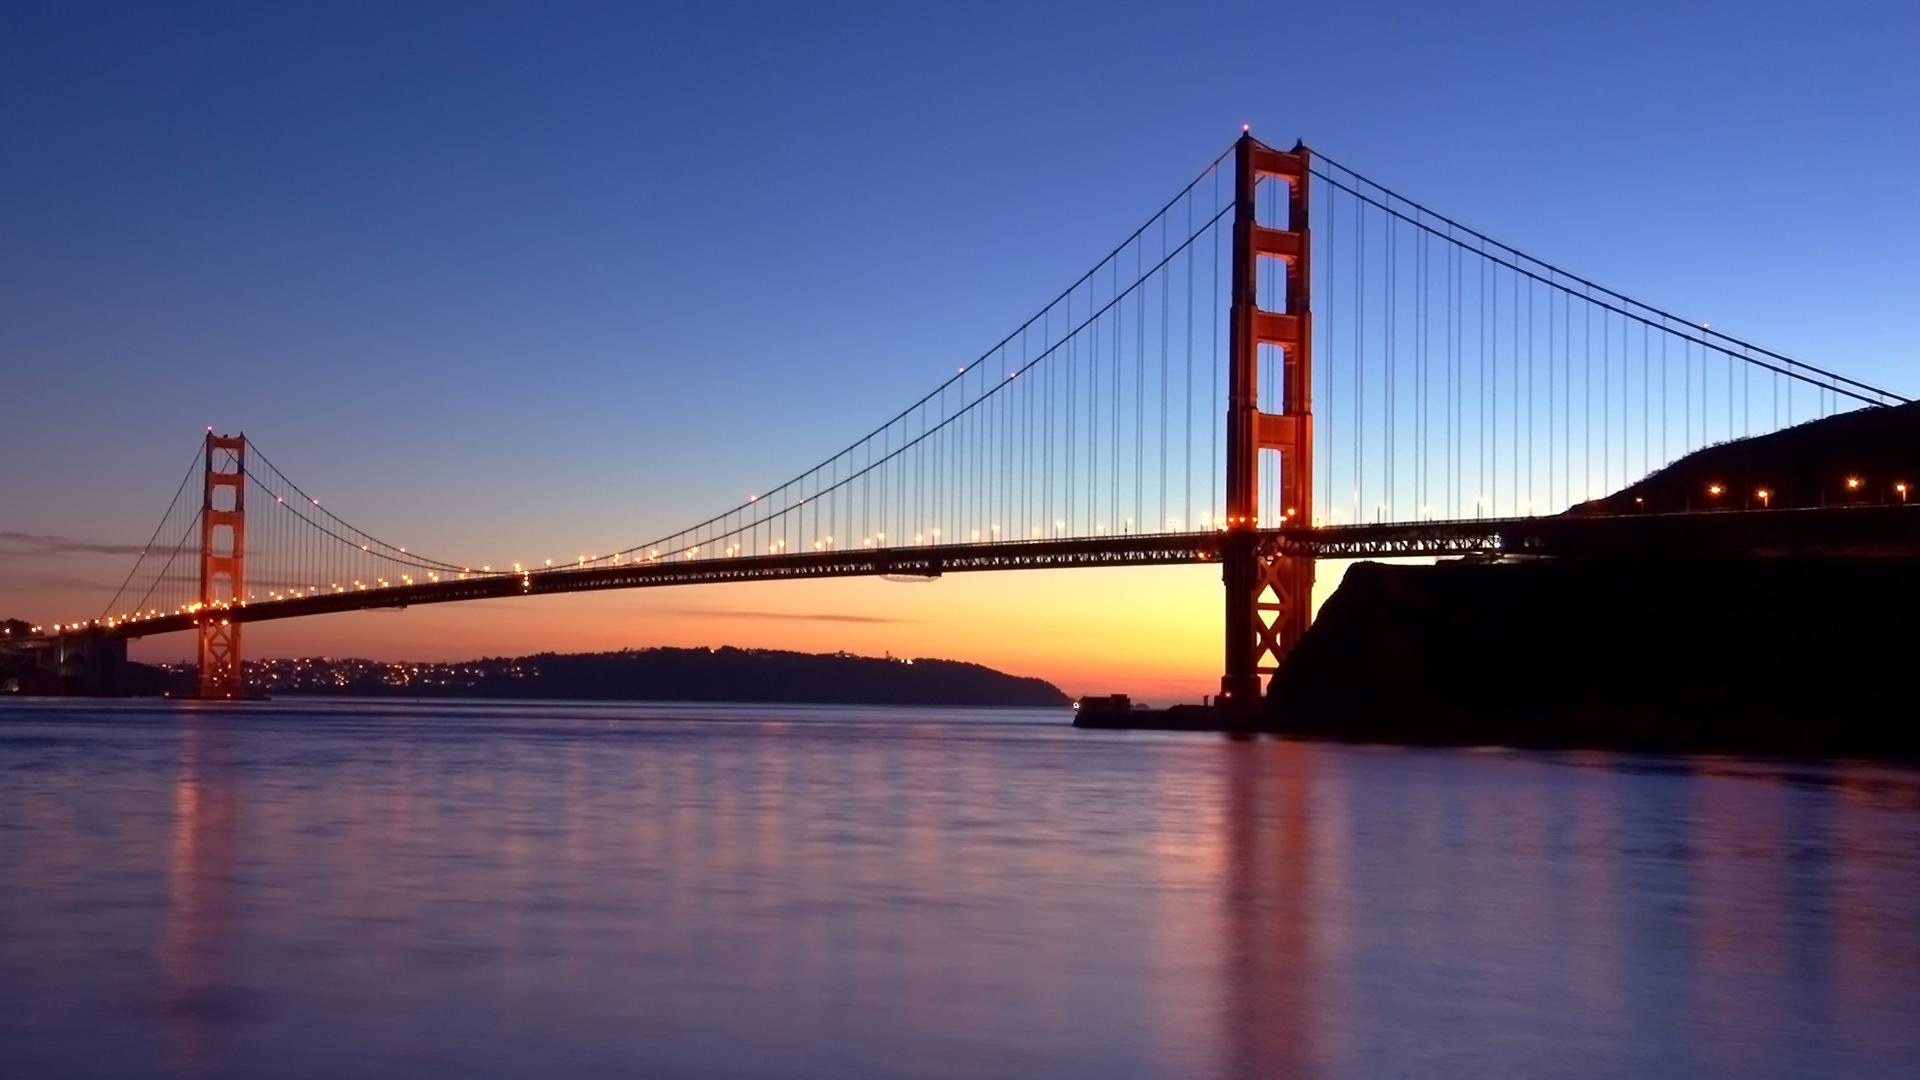 San Francisco Wallpaper Hd 50569 1920x1080